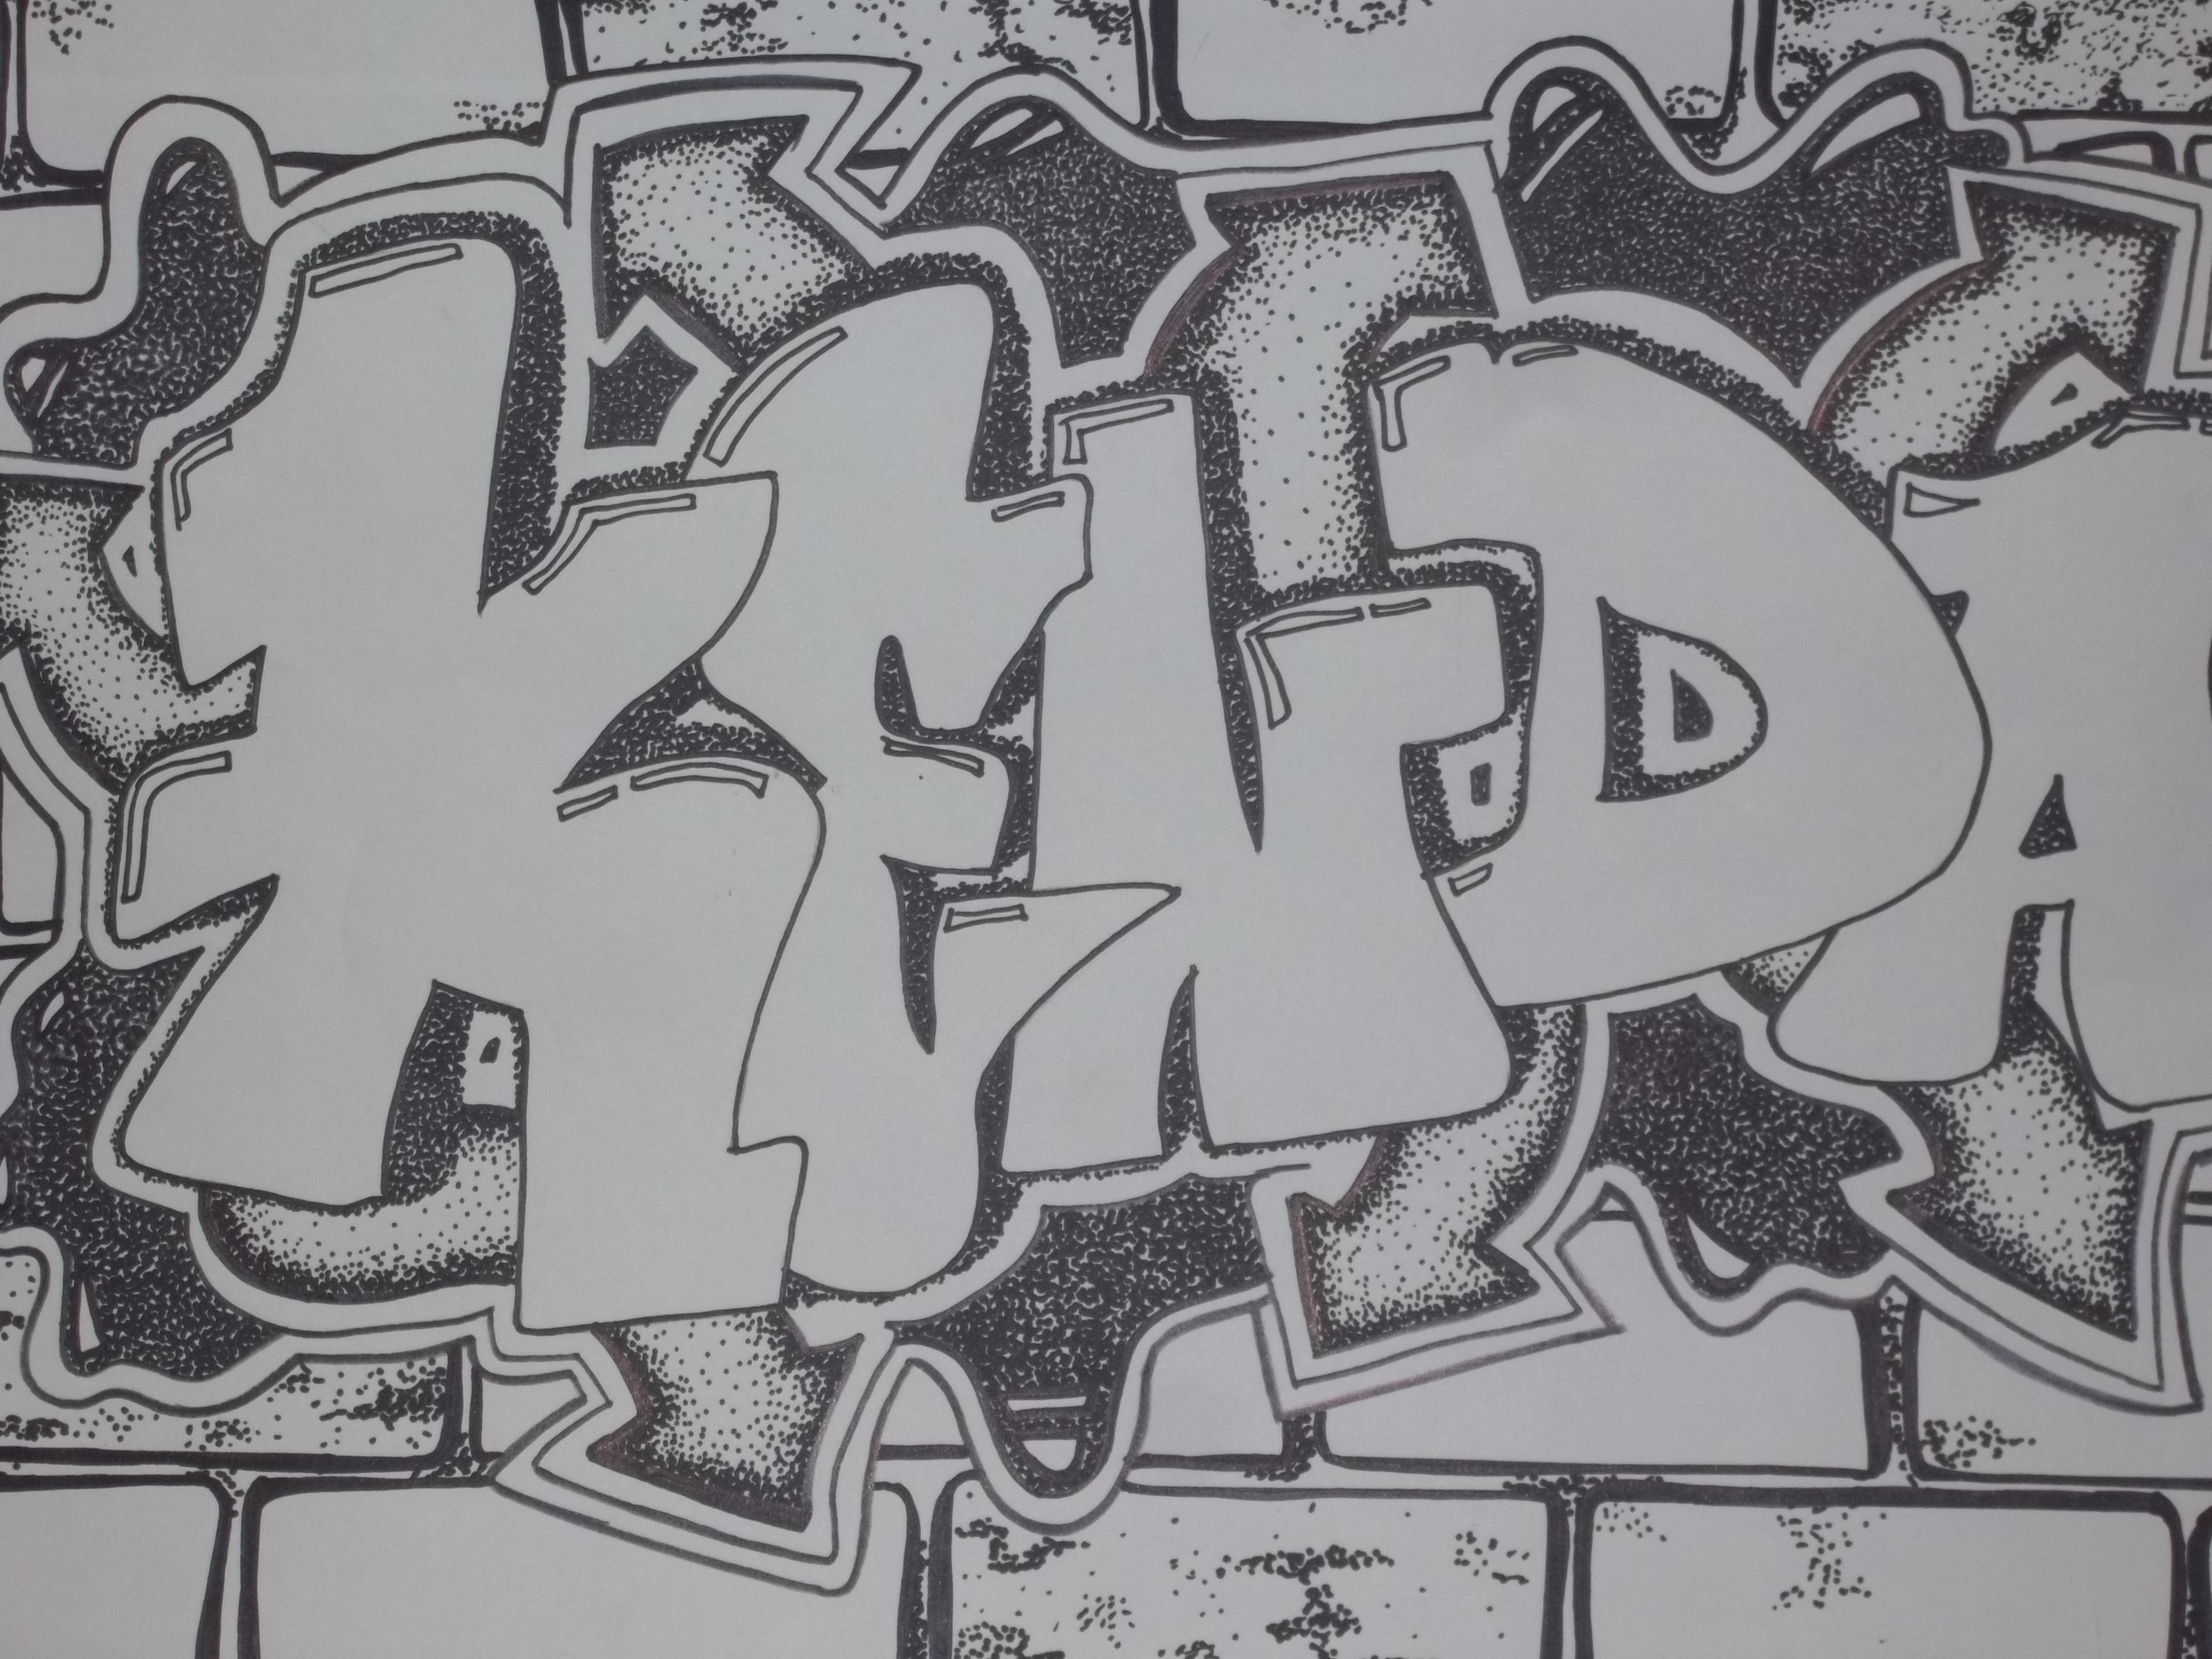 Czeshop Images Drawing Ideas For High School Art Class